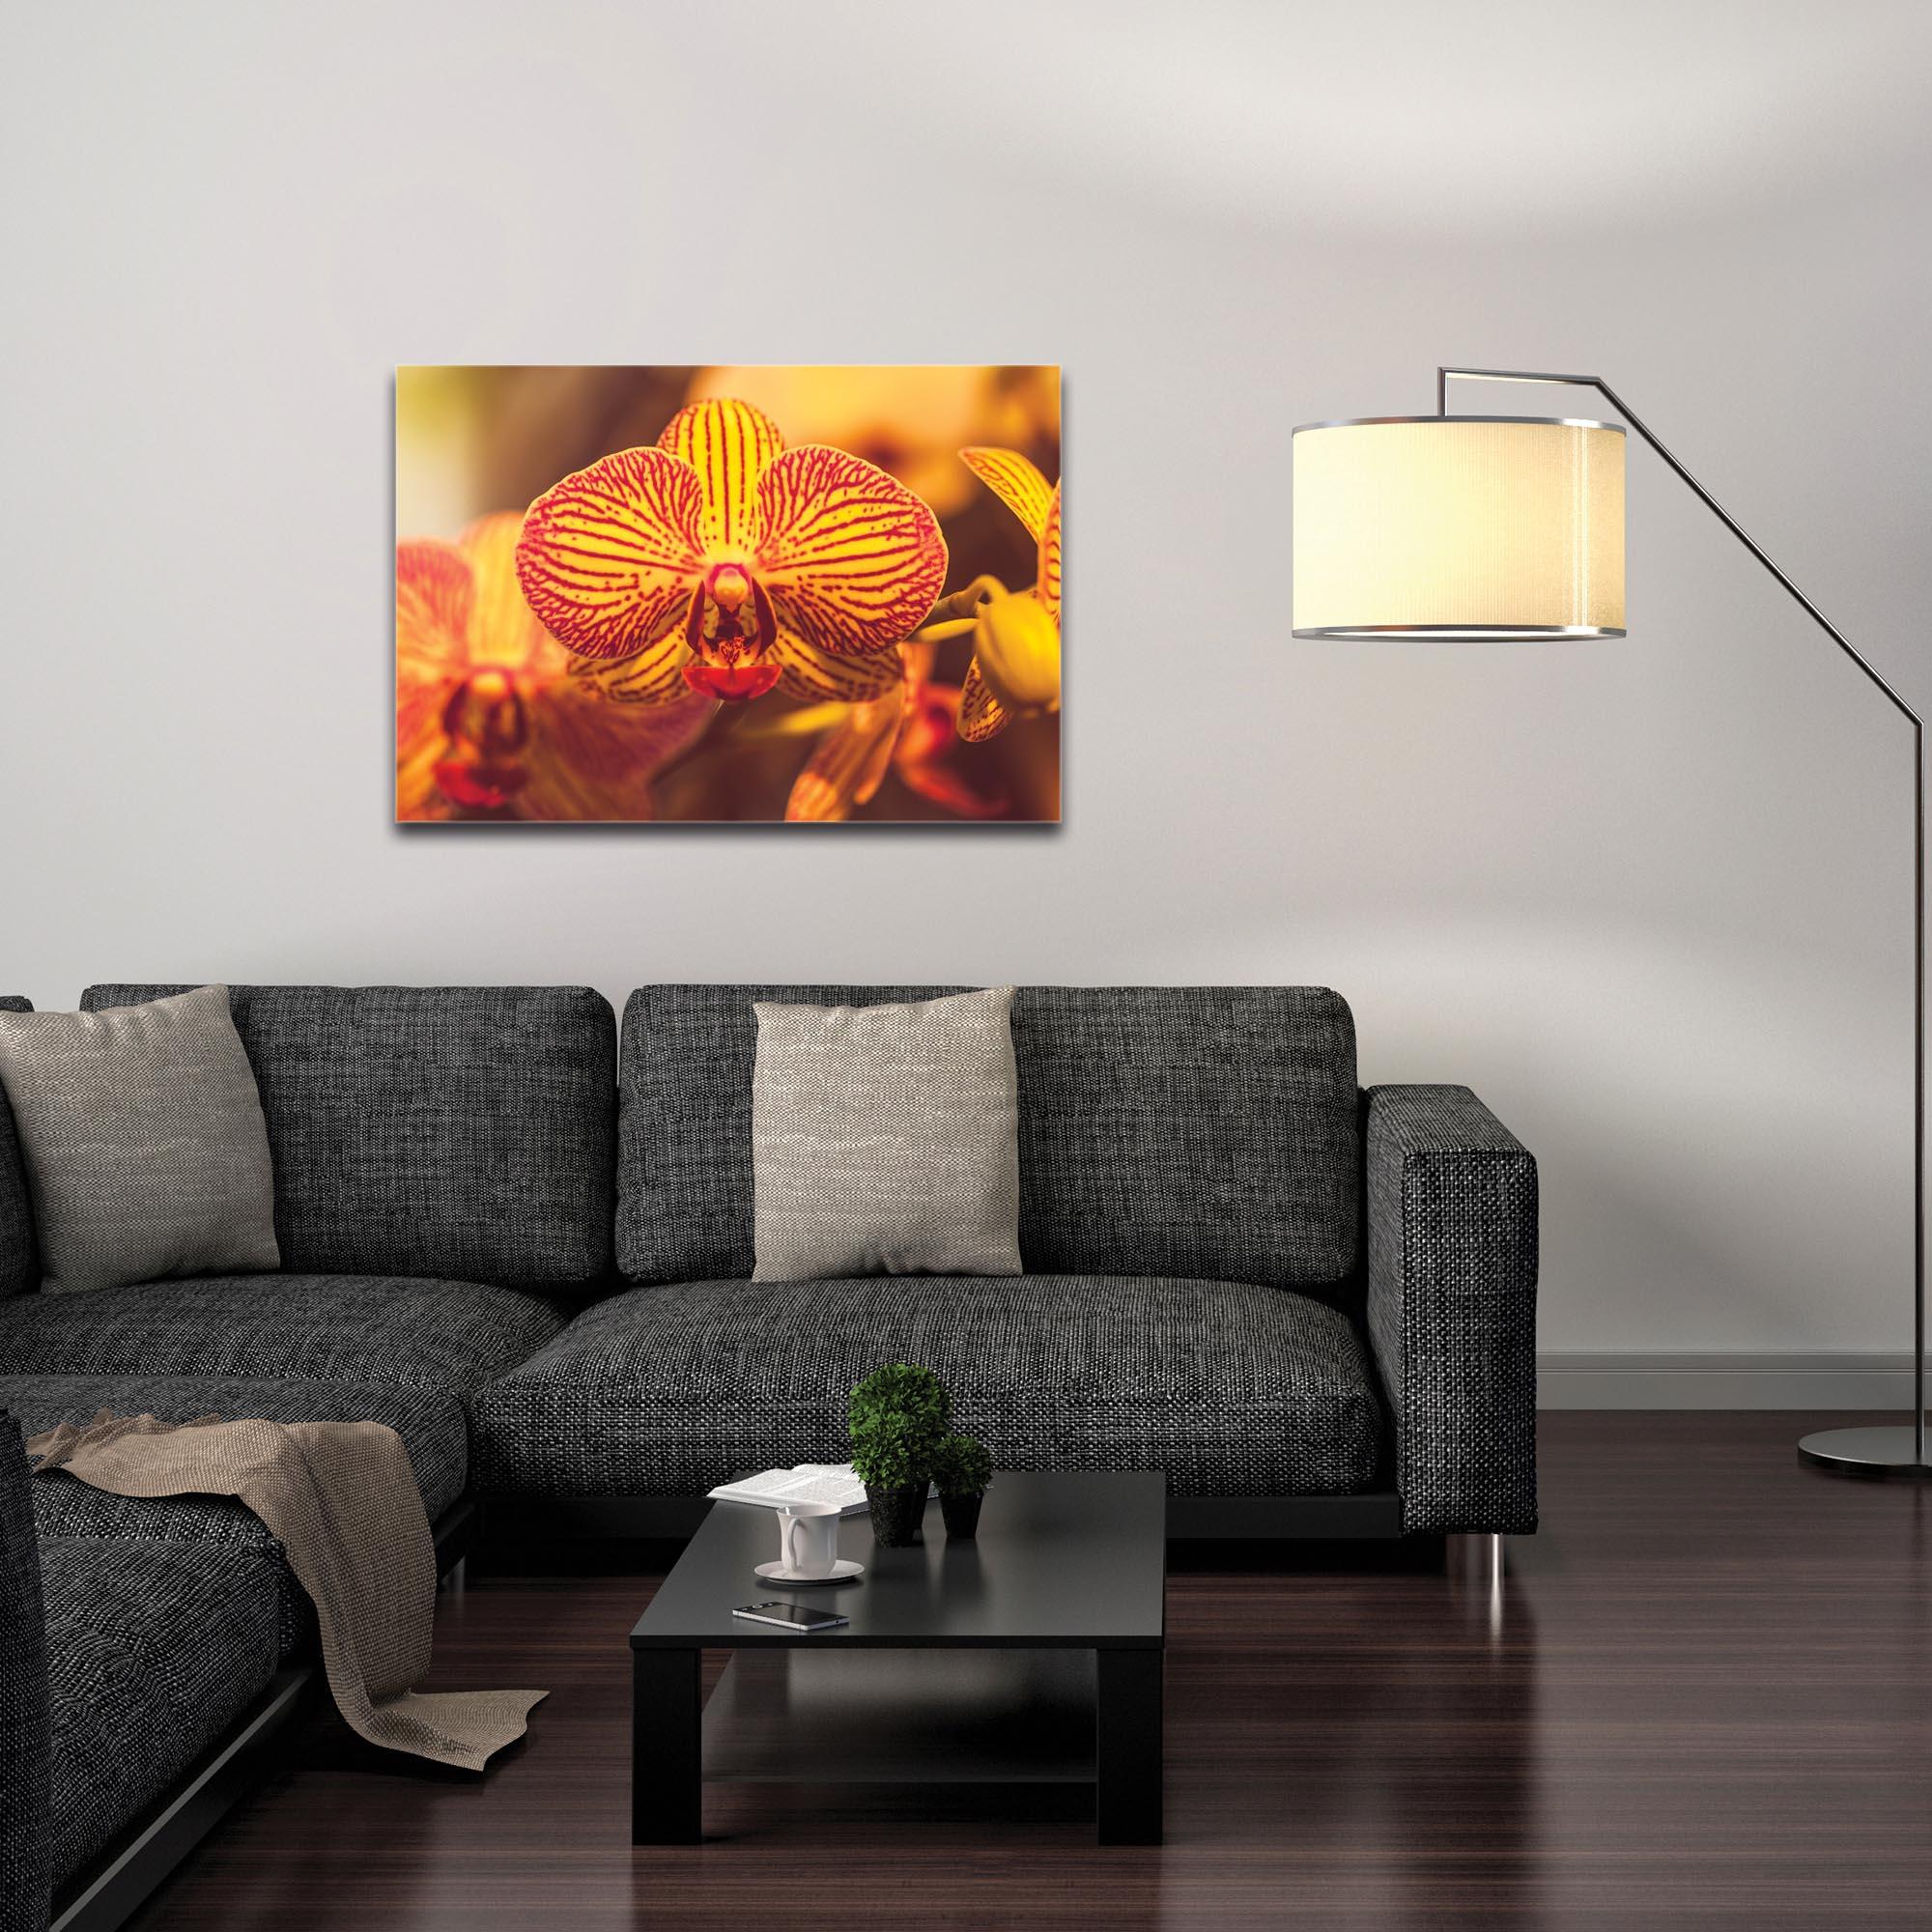 Nature Photography 'Sunset Bloom' - Flower Blossom Art on Metal or Plexiglass - Image 3